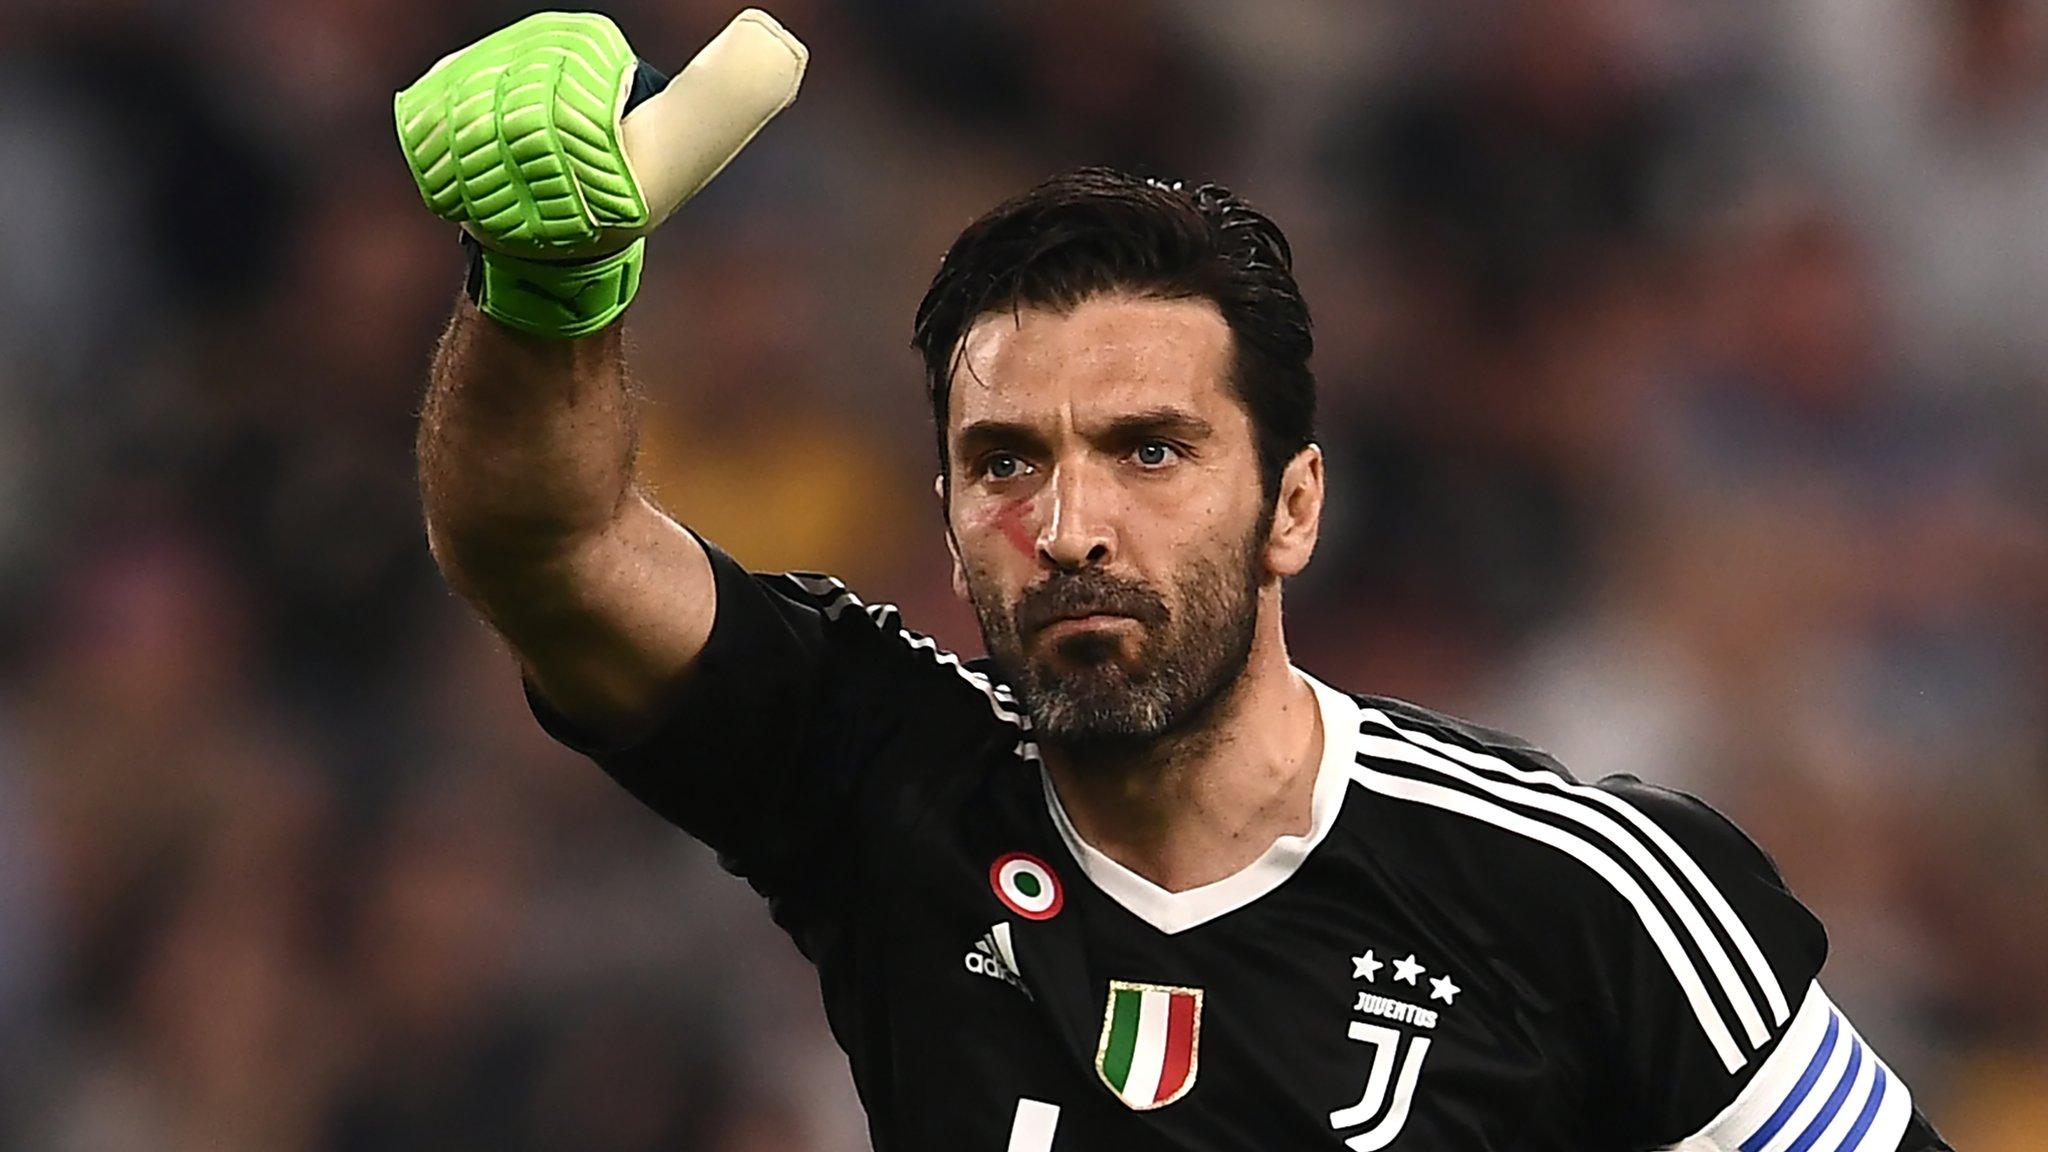 Gianluigi Buffon: Italy goalkeeper to play final game for Juventus